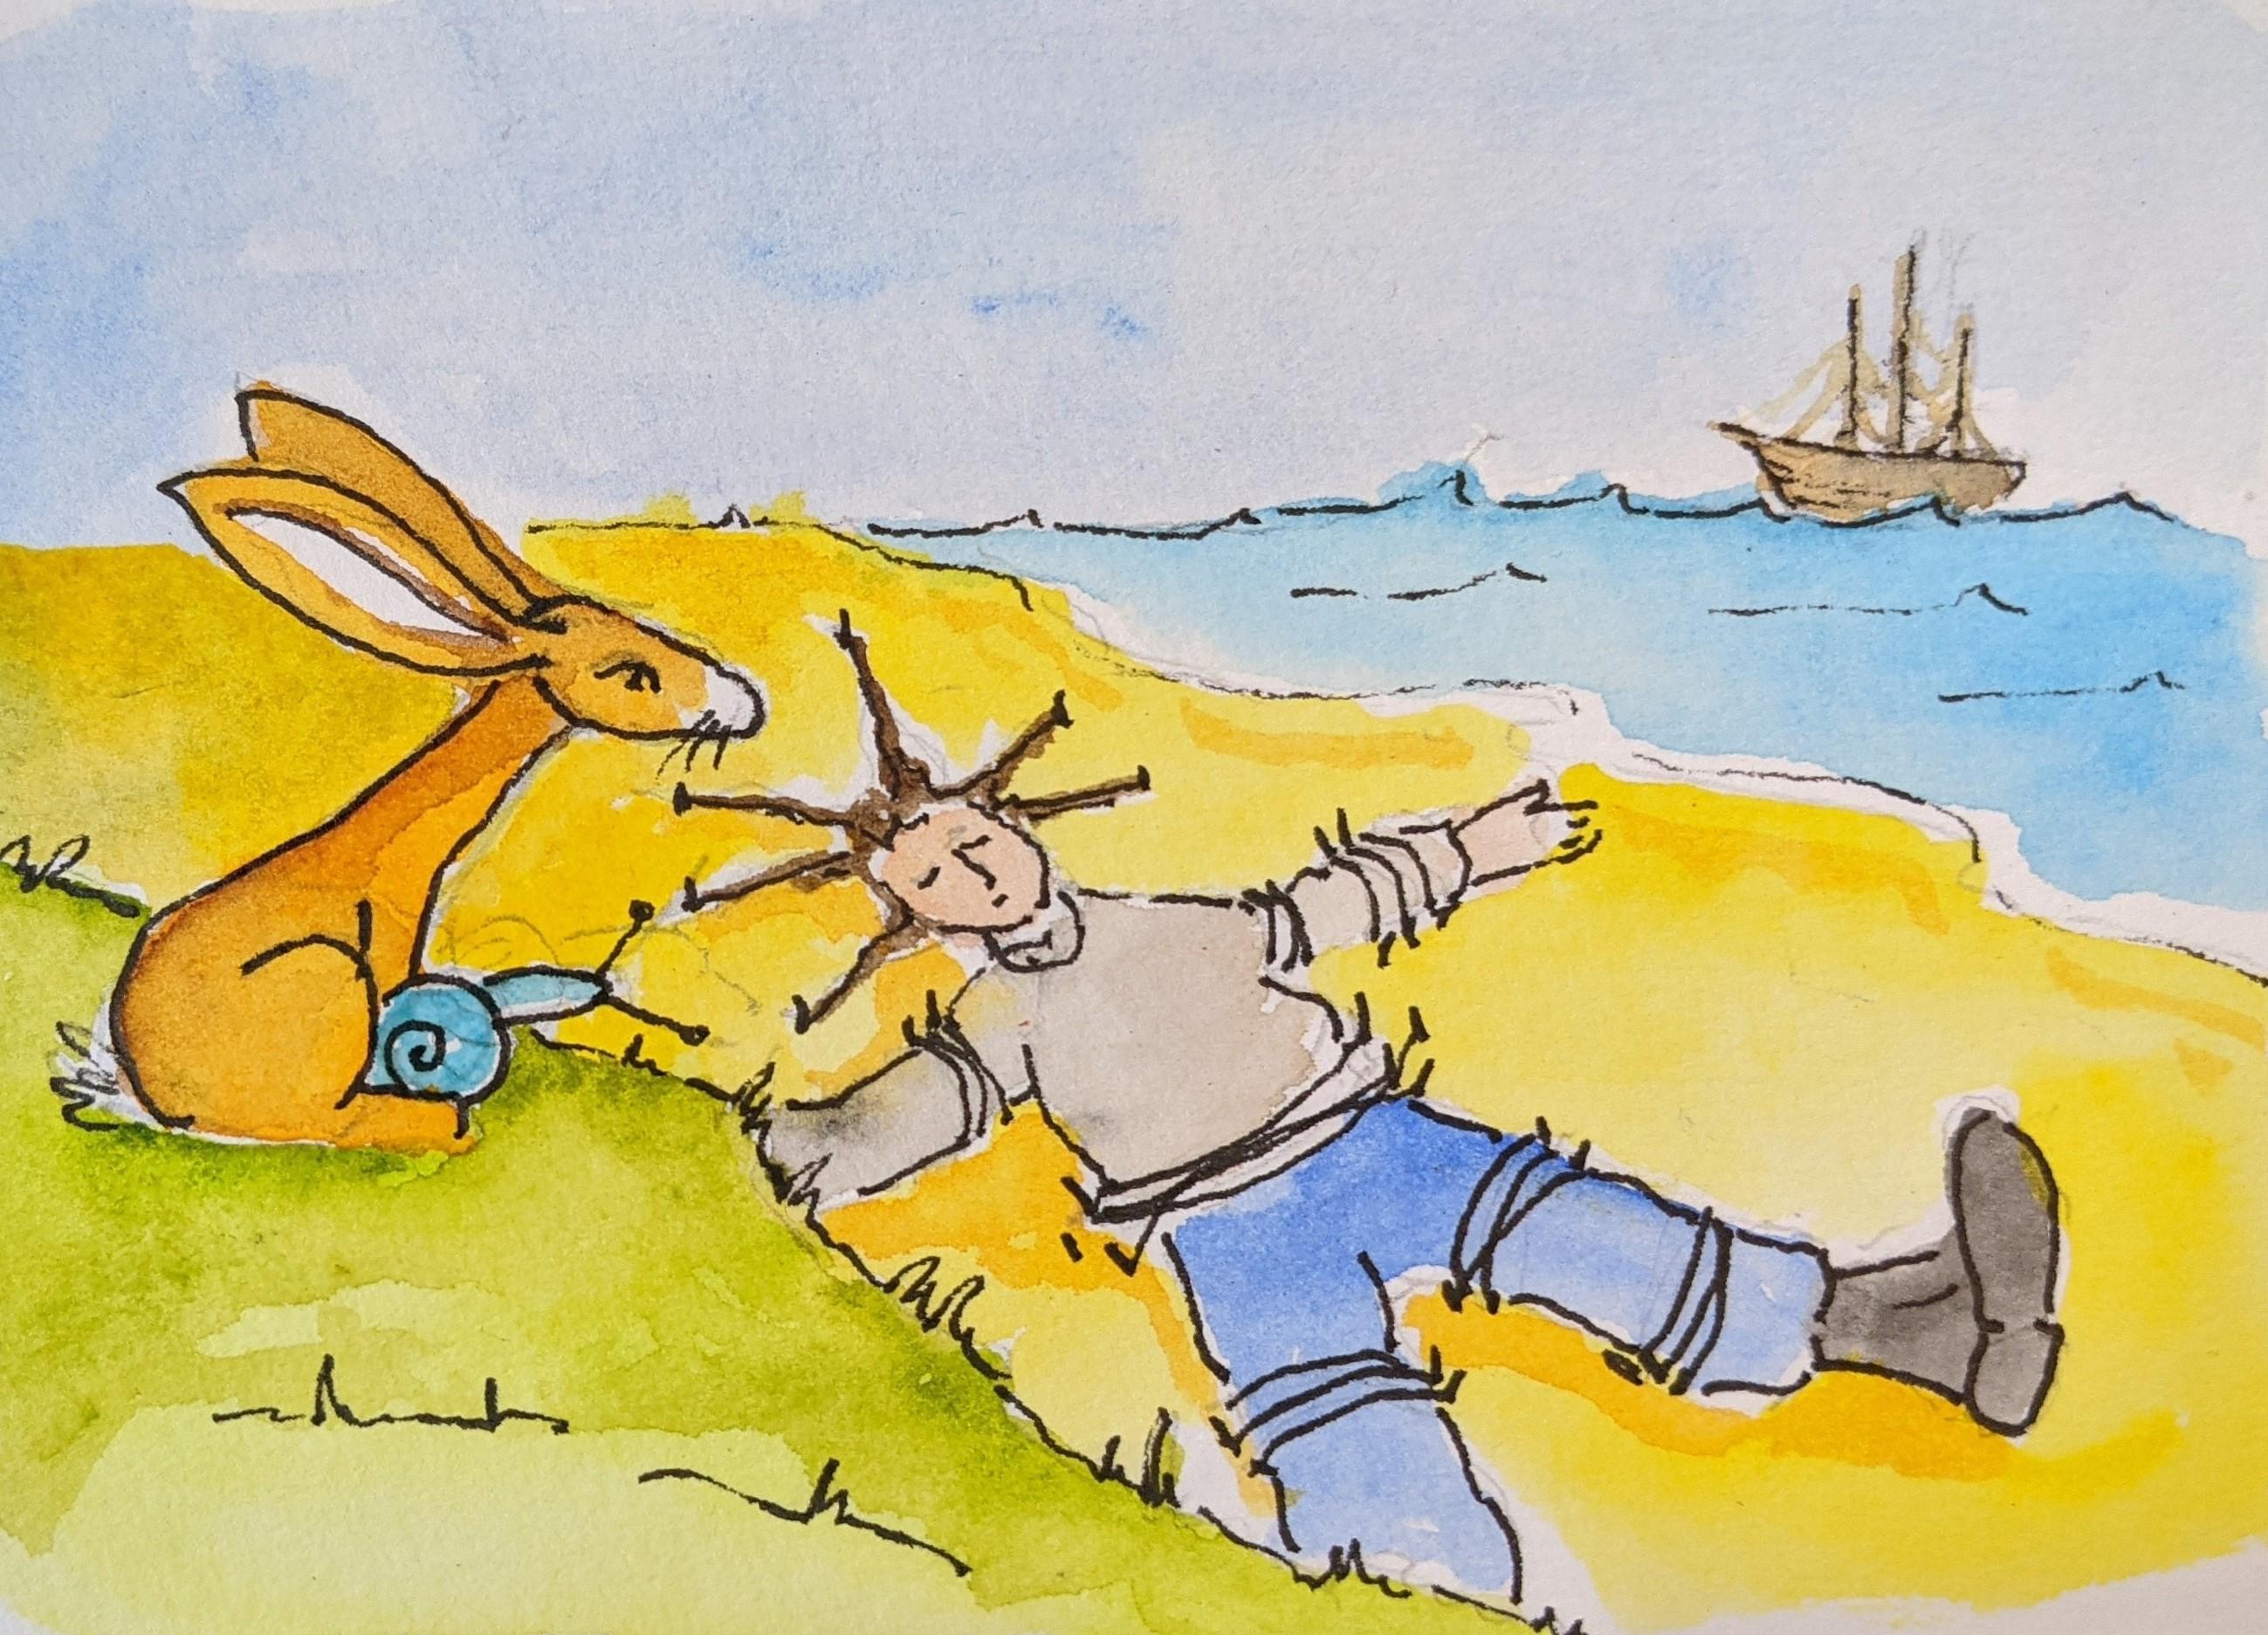 Day 22 Gulliver's Travels